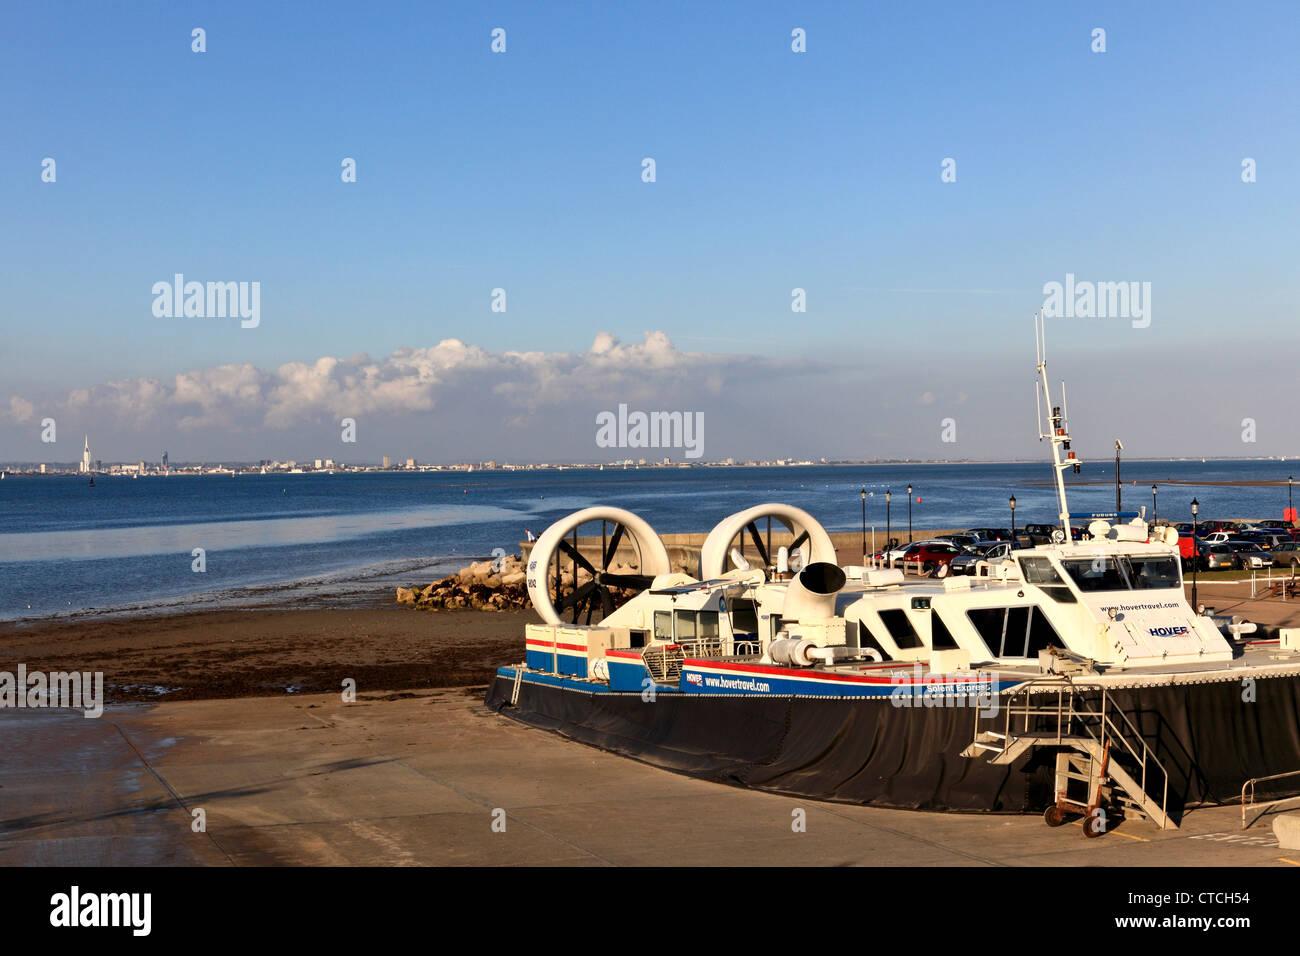 4146. Hovercraft Harbour, Ryde, Isle of Wight, UK - Stock Image